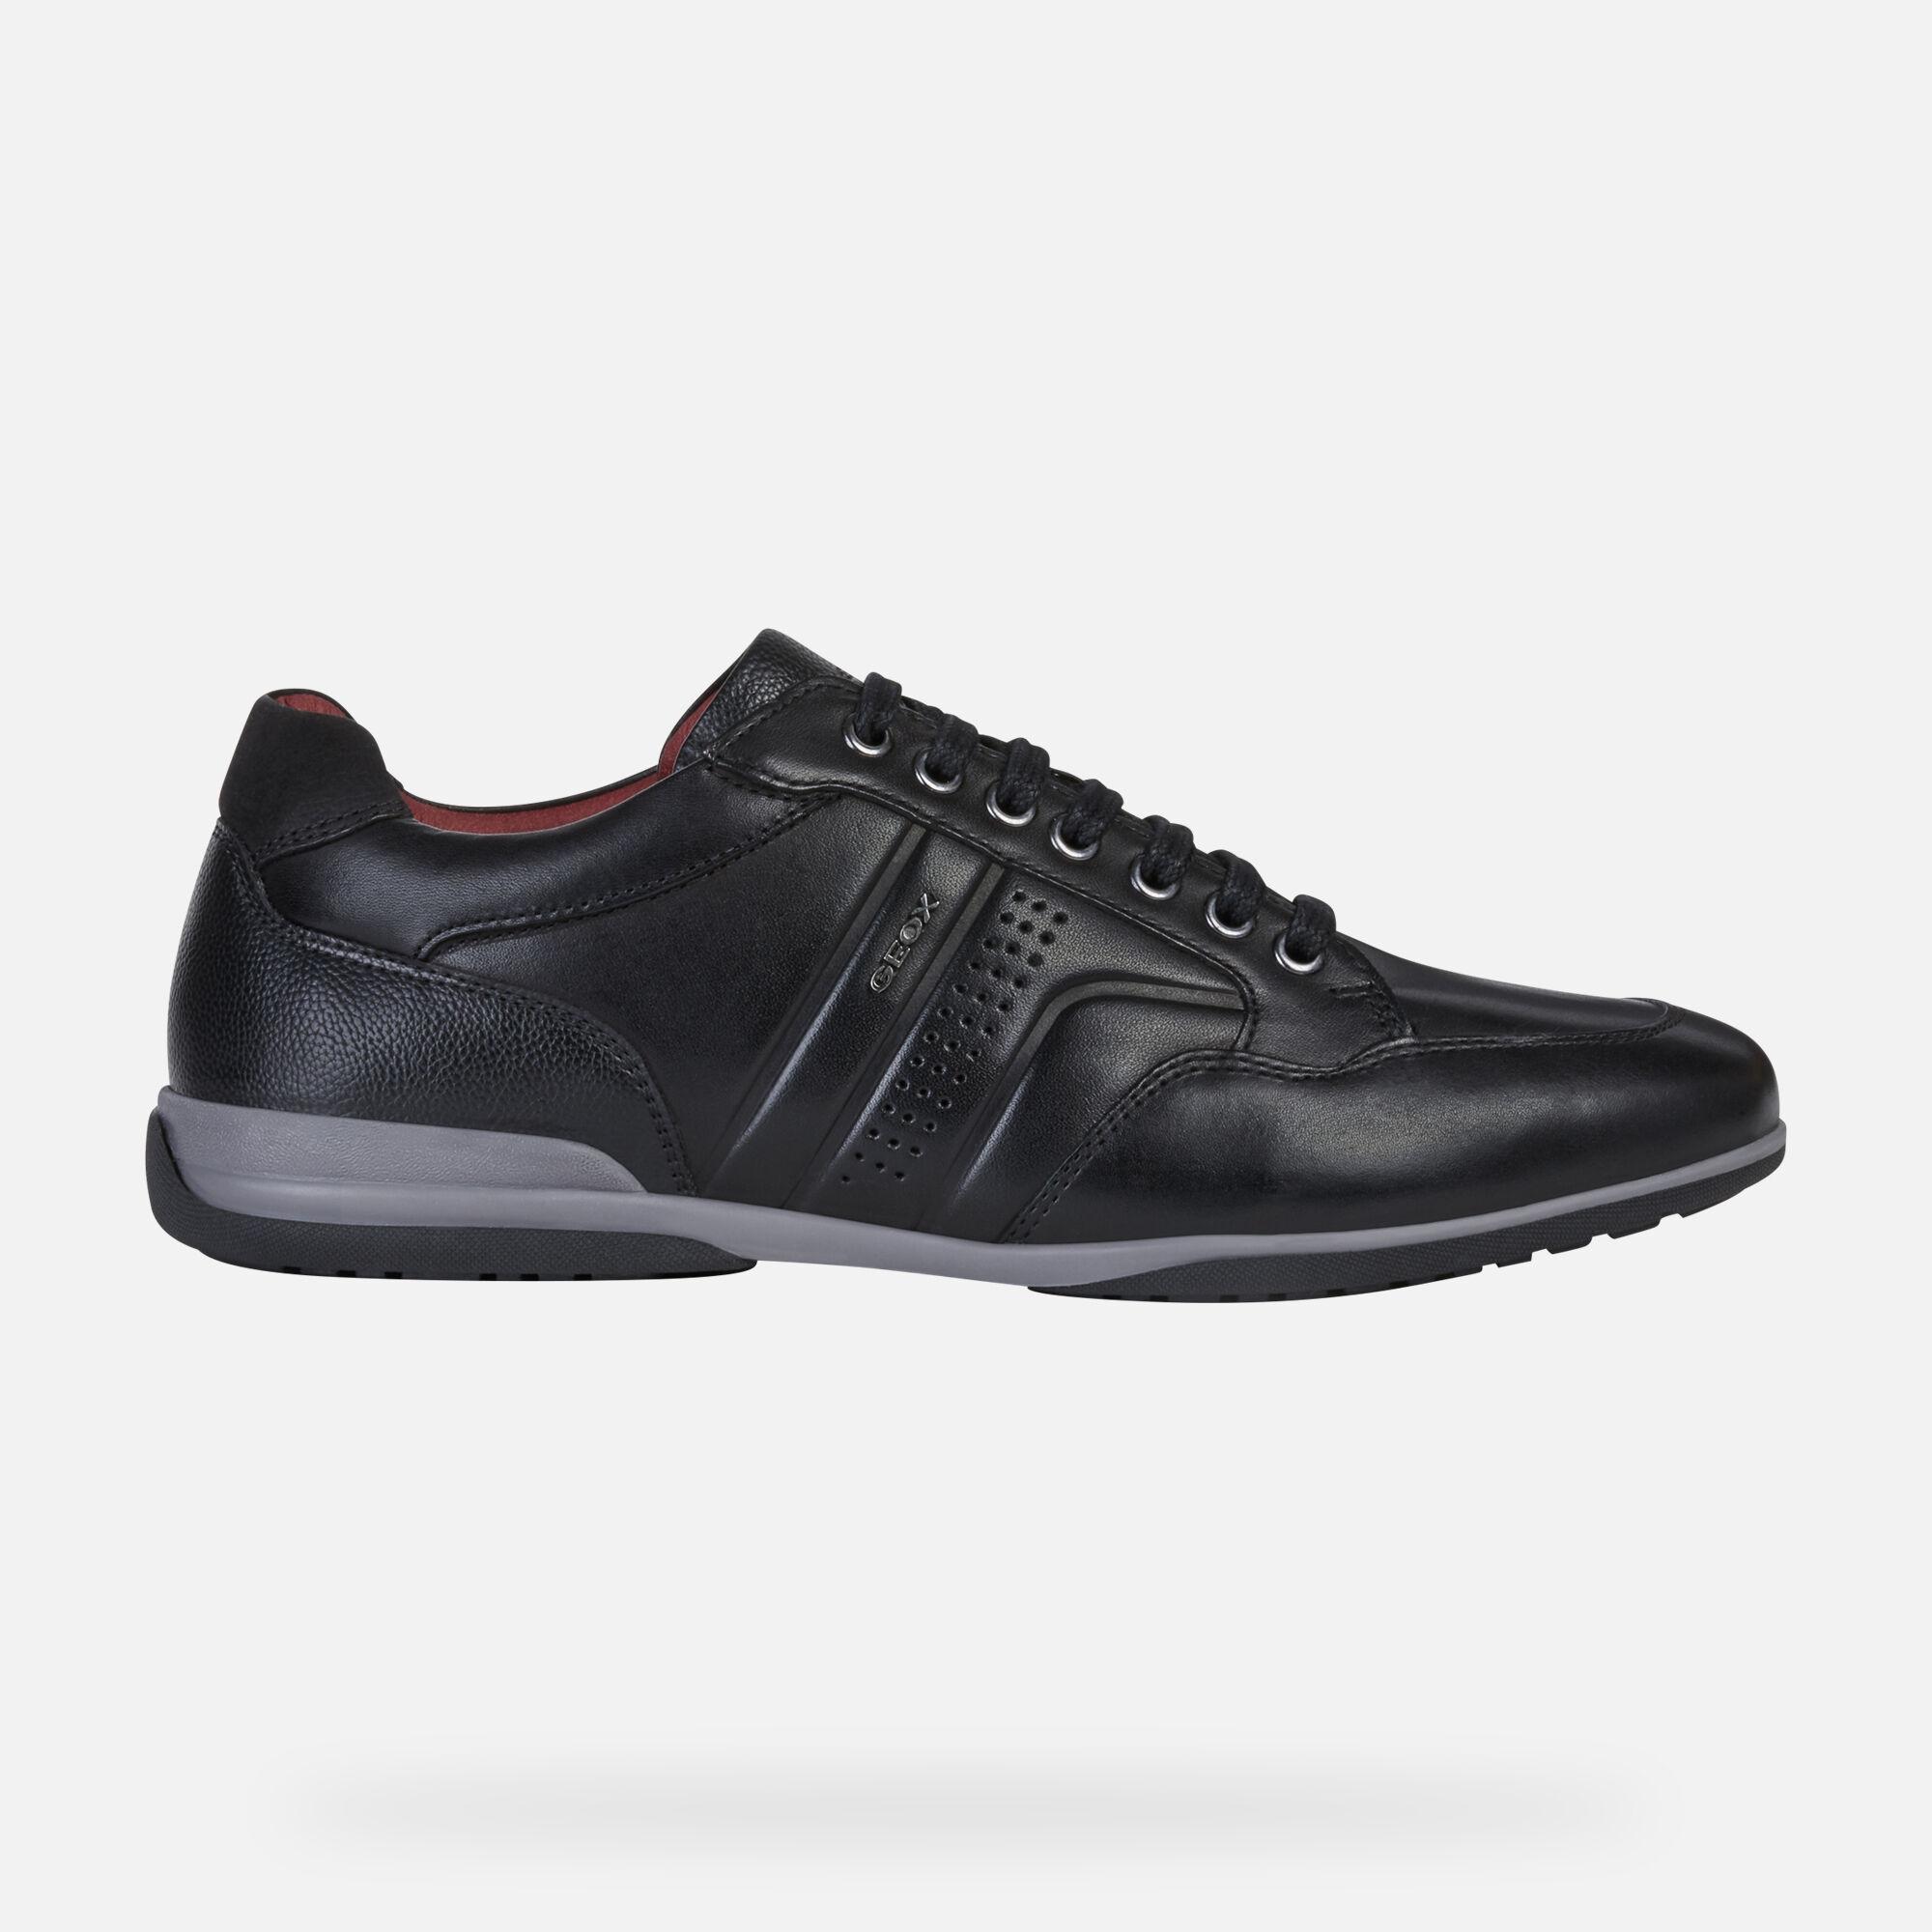 Geox 2019 Deutschland offizieller Online Shop Damen Schuhe